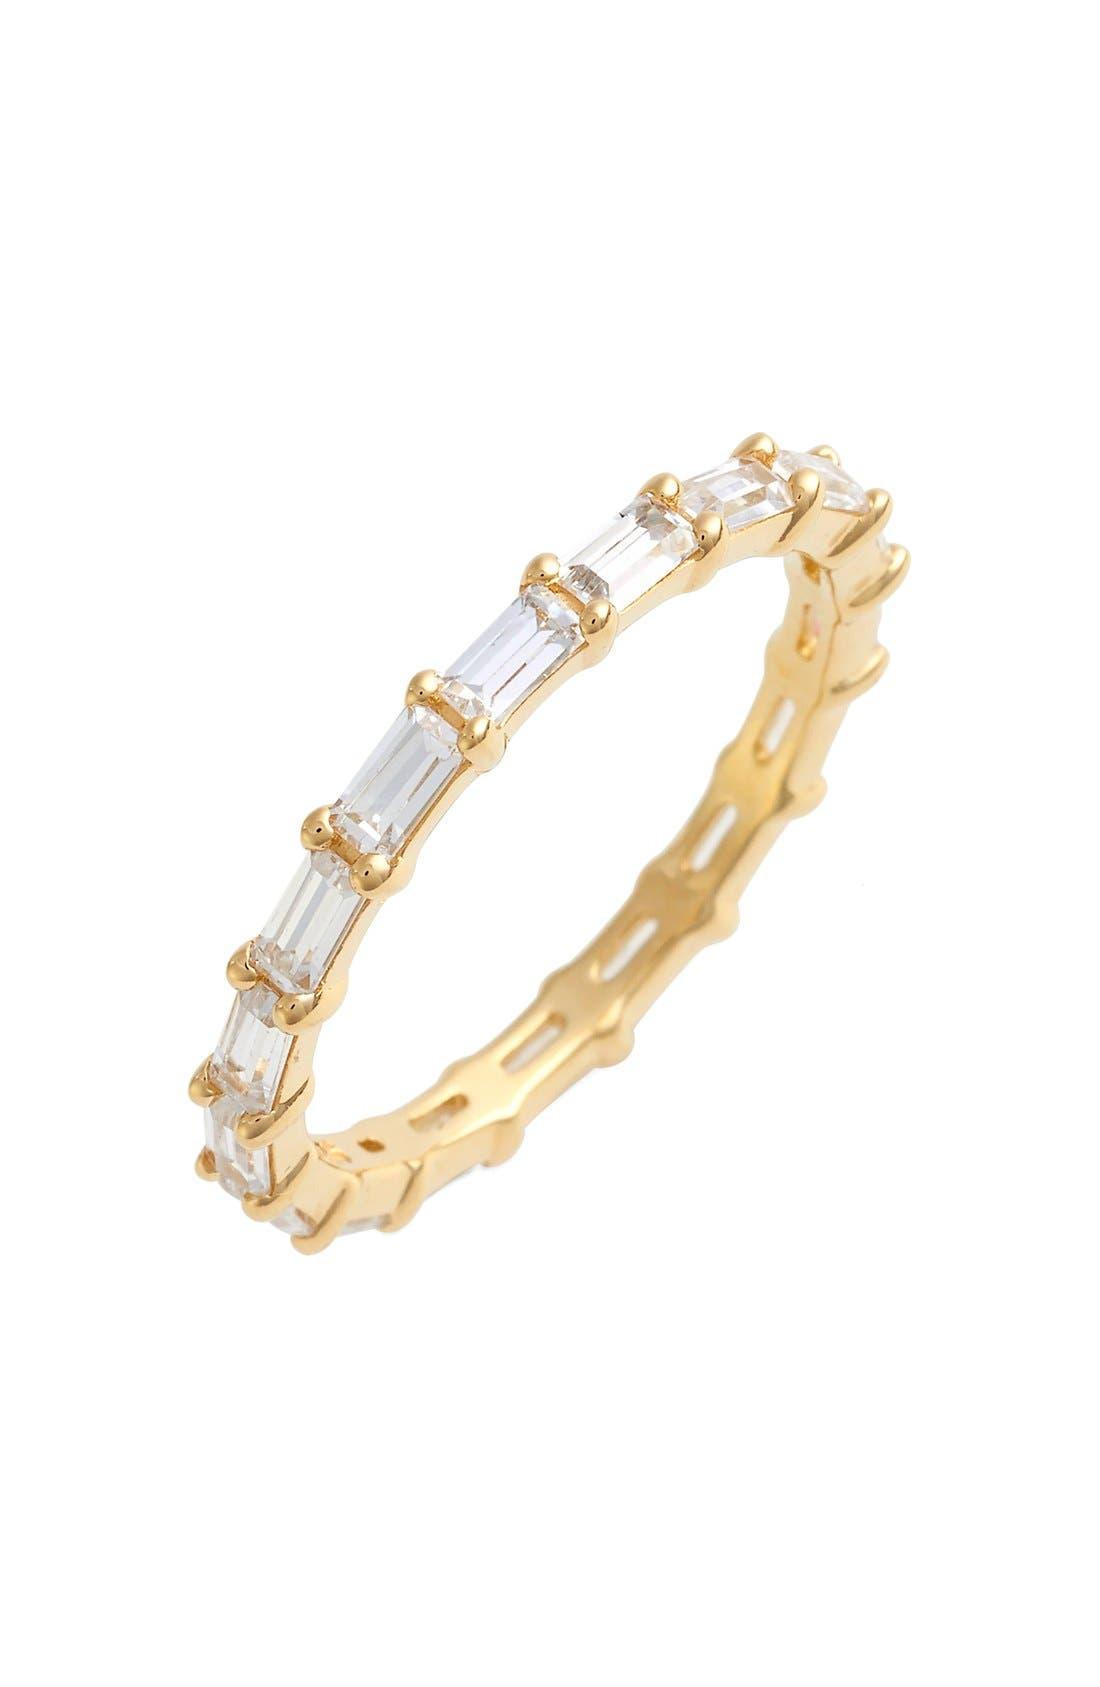 Main Image - Judith Jack Stackable Cubic Zirconia Baguette Ring